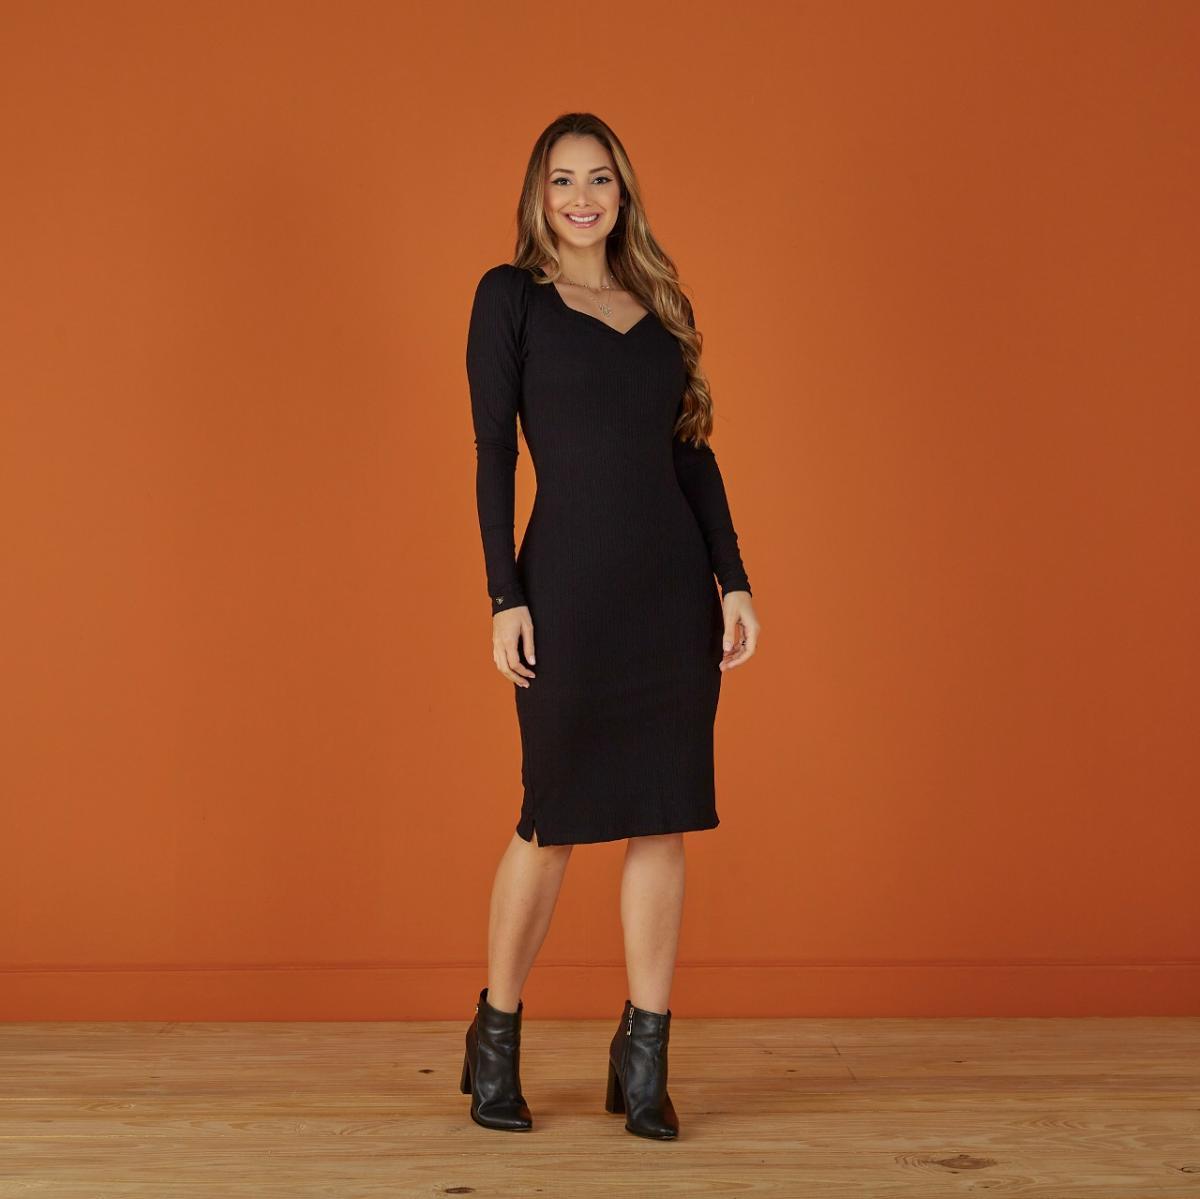 Vestido Aline Na Malha Canelada Premium, Moda Evangélica- Tatá Martello